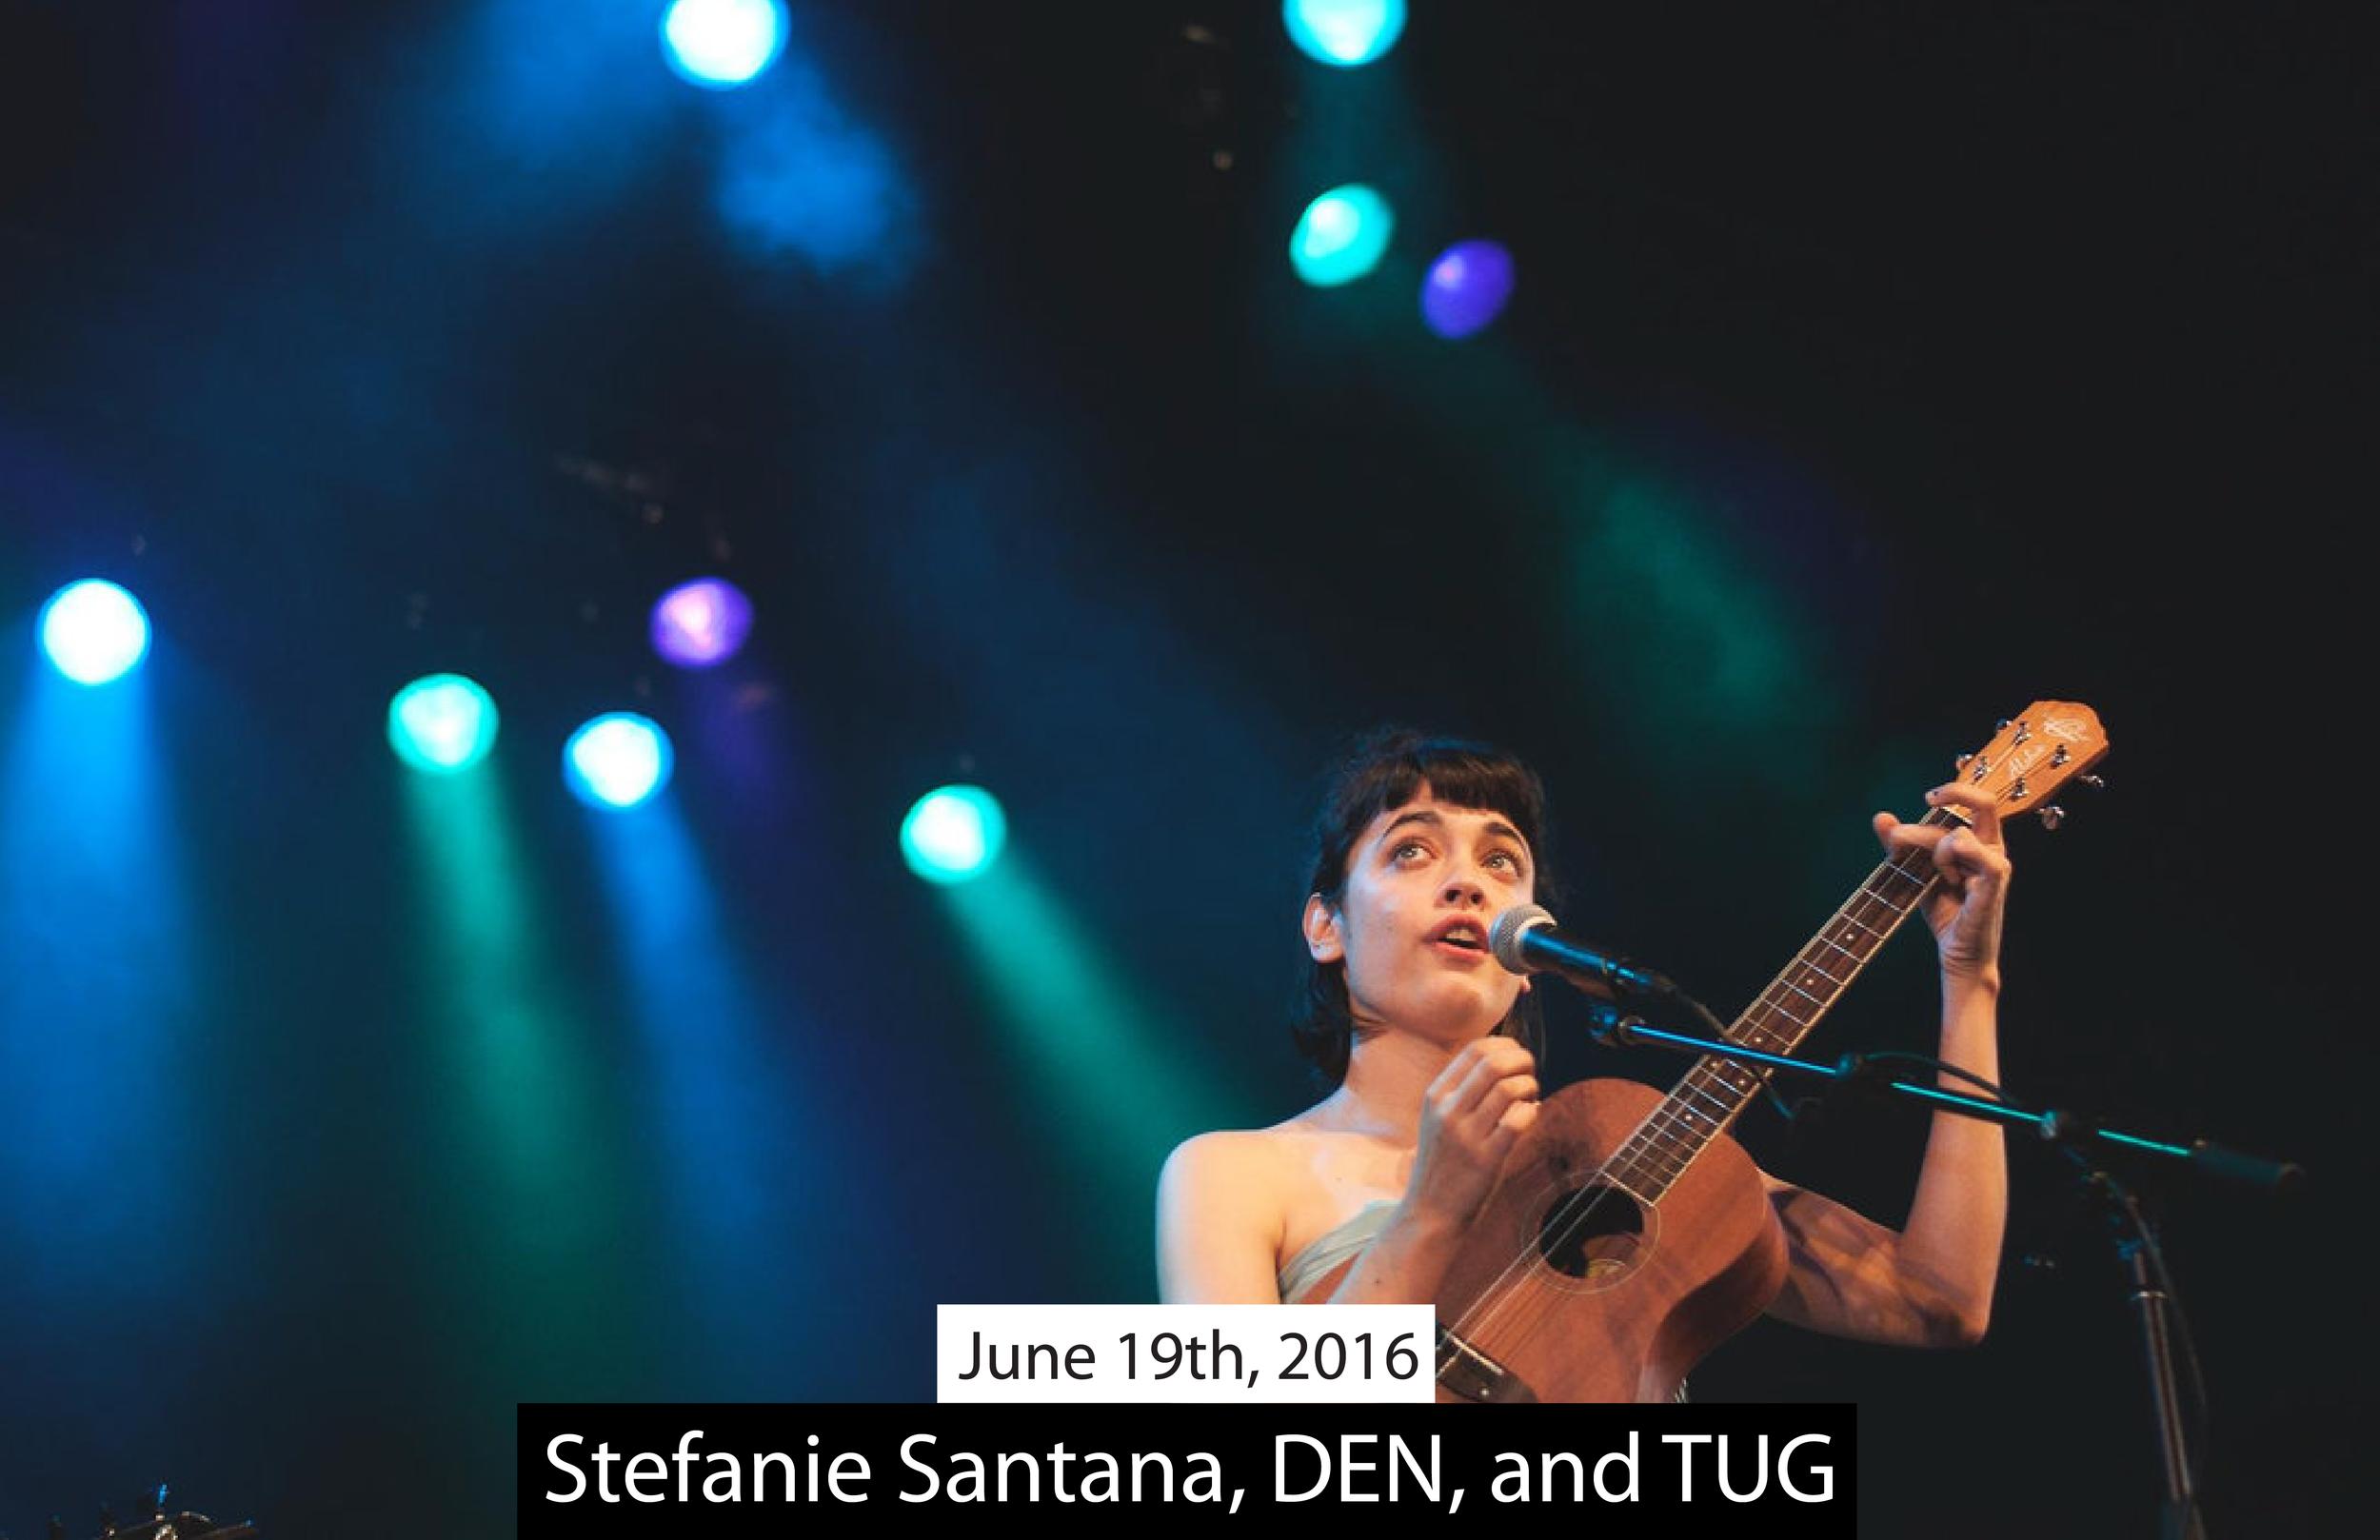 Stefanie Sant NEW NEW 2019-01.png